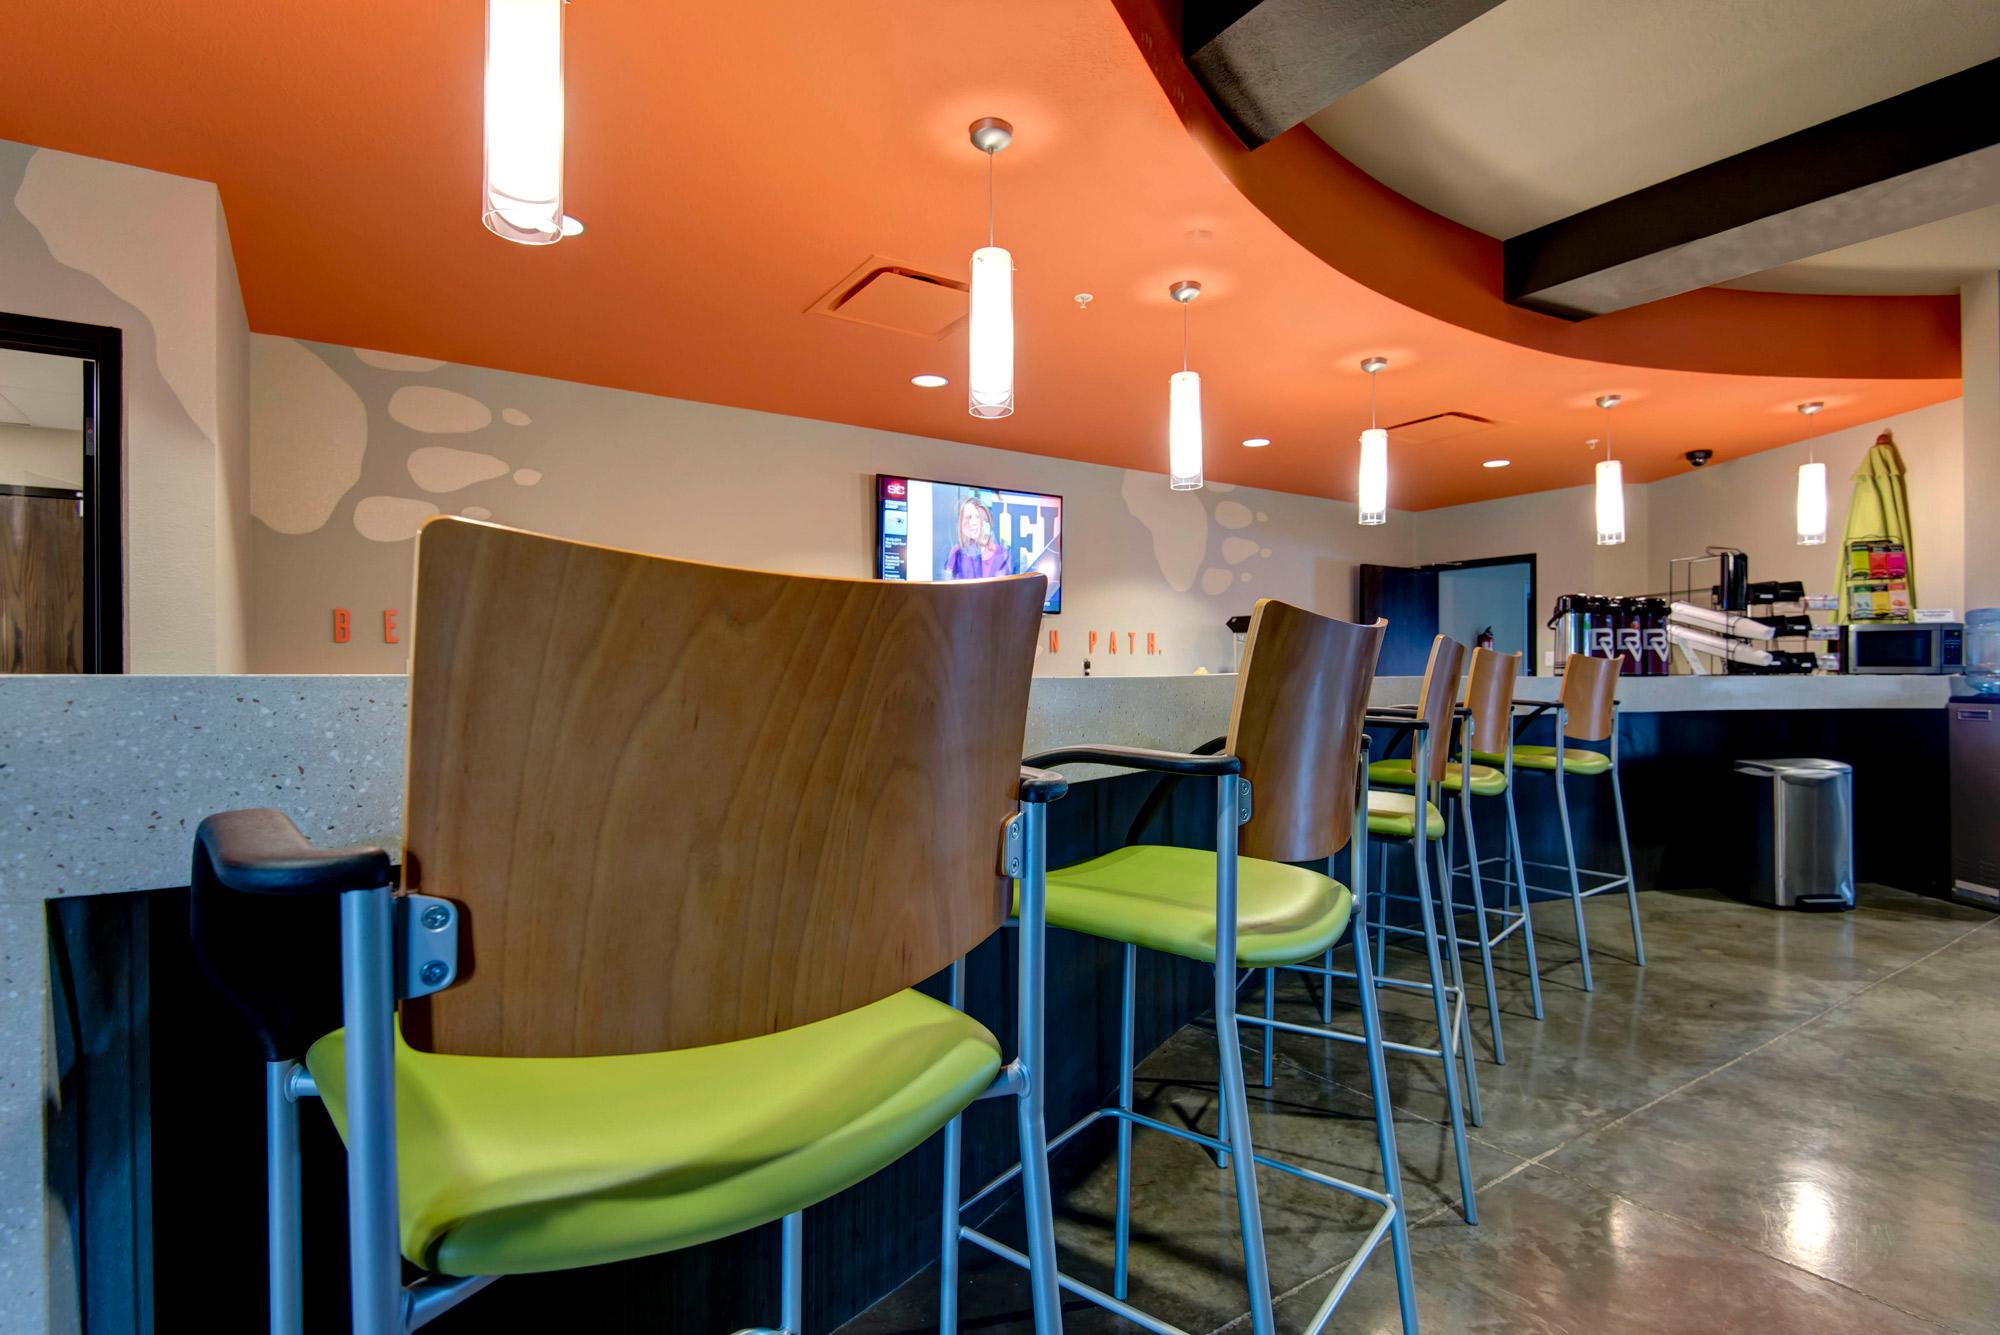 Bear-Village-H-Design-Interior-02.jpg